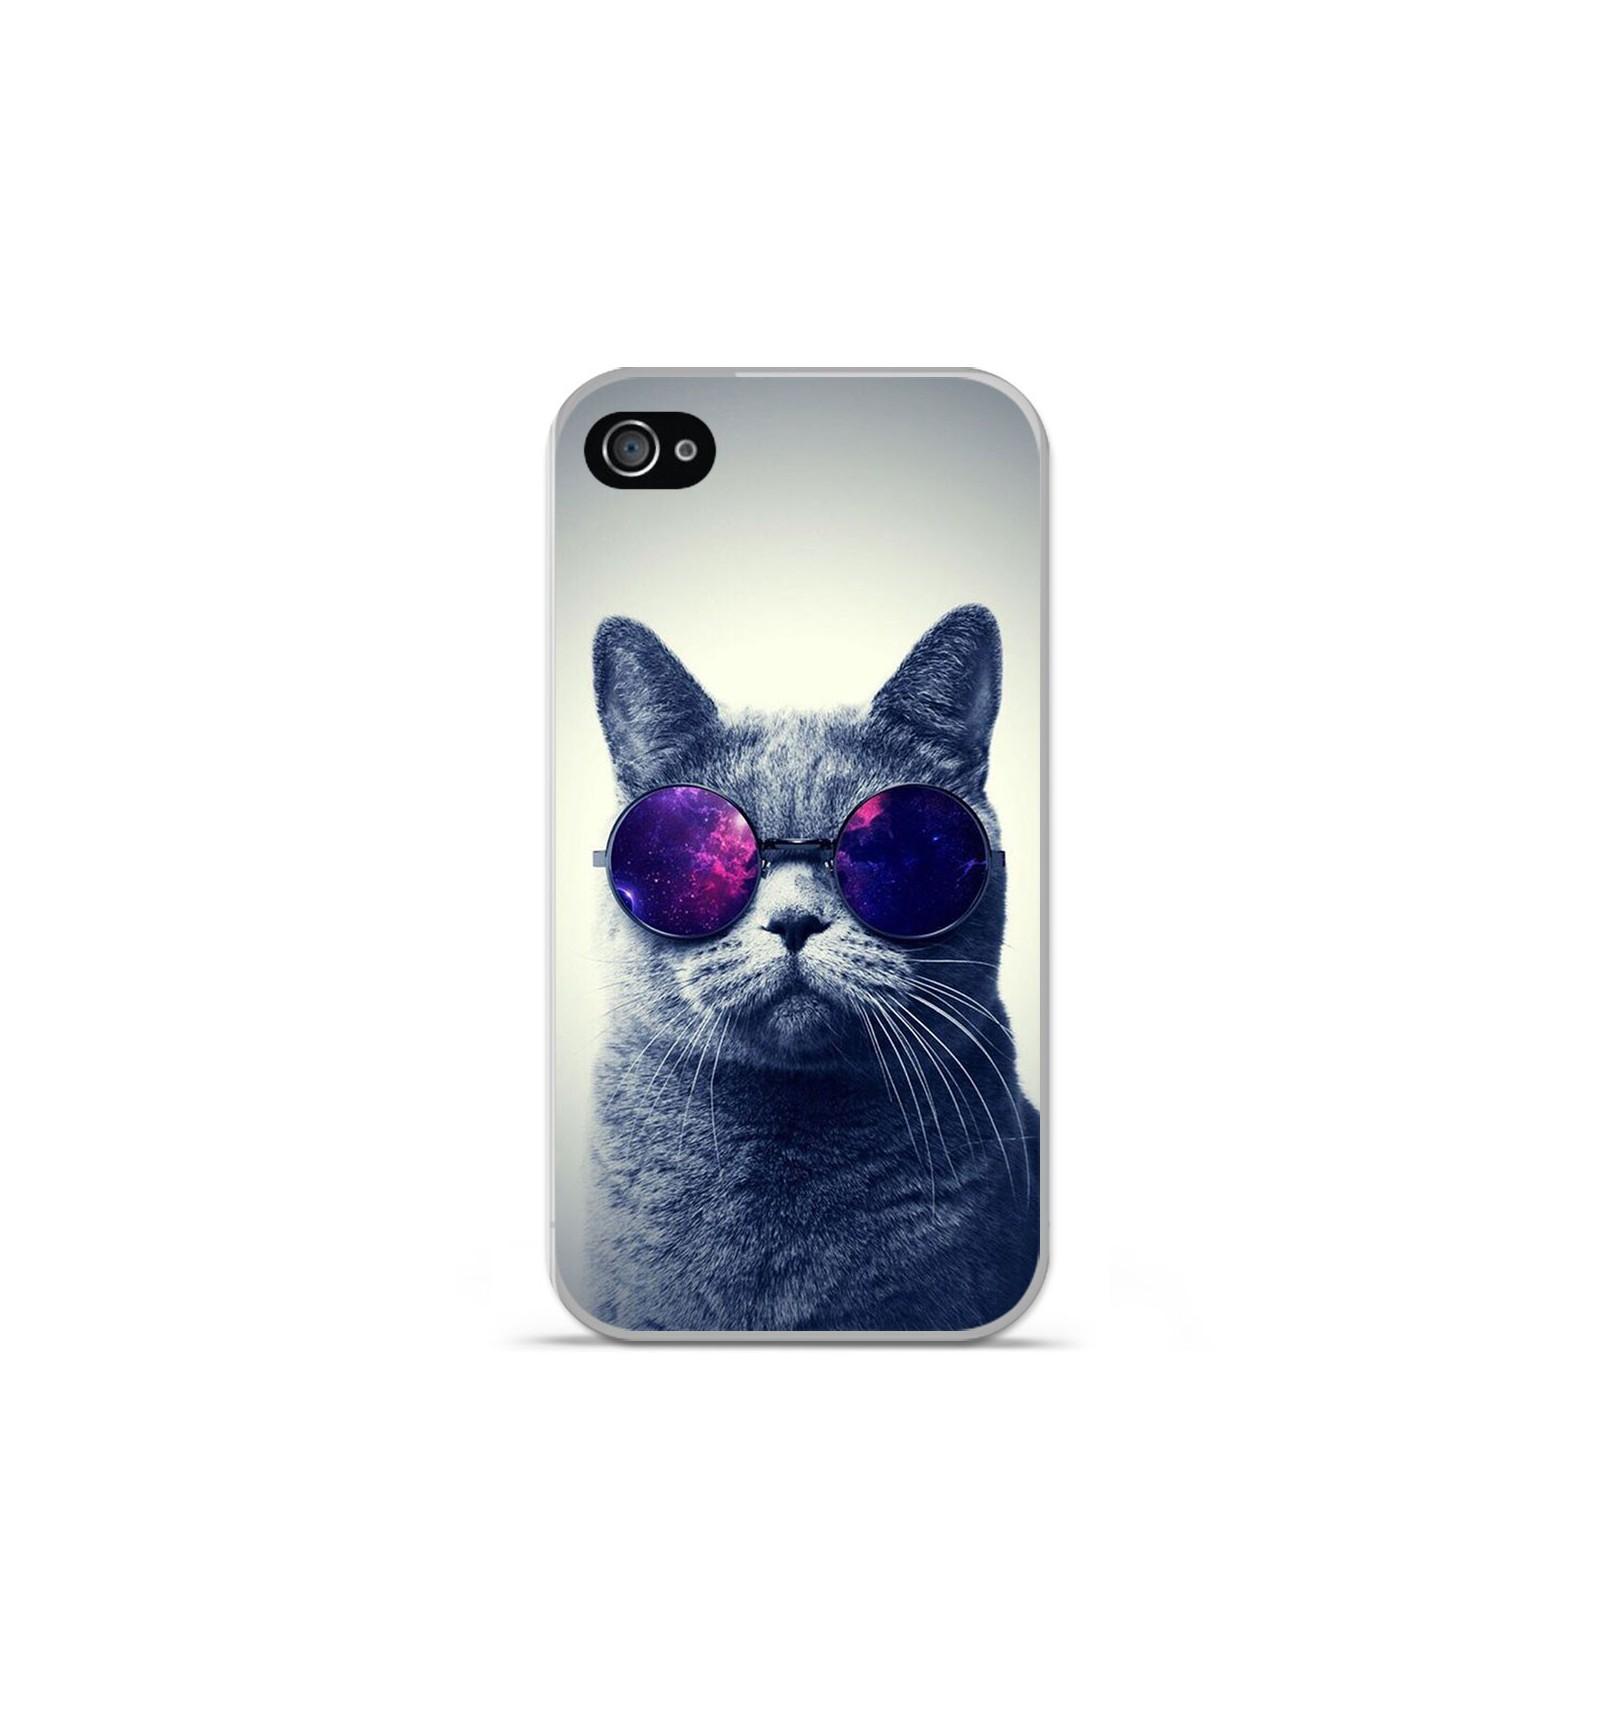 coque iphone 4 en silicone animaux